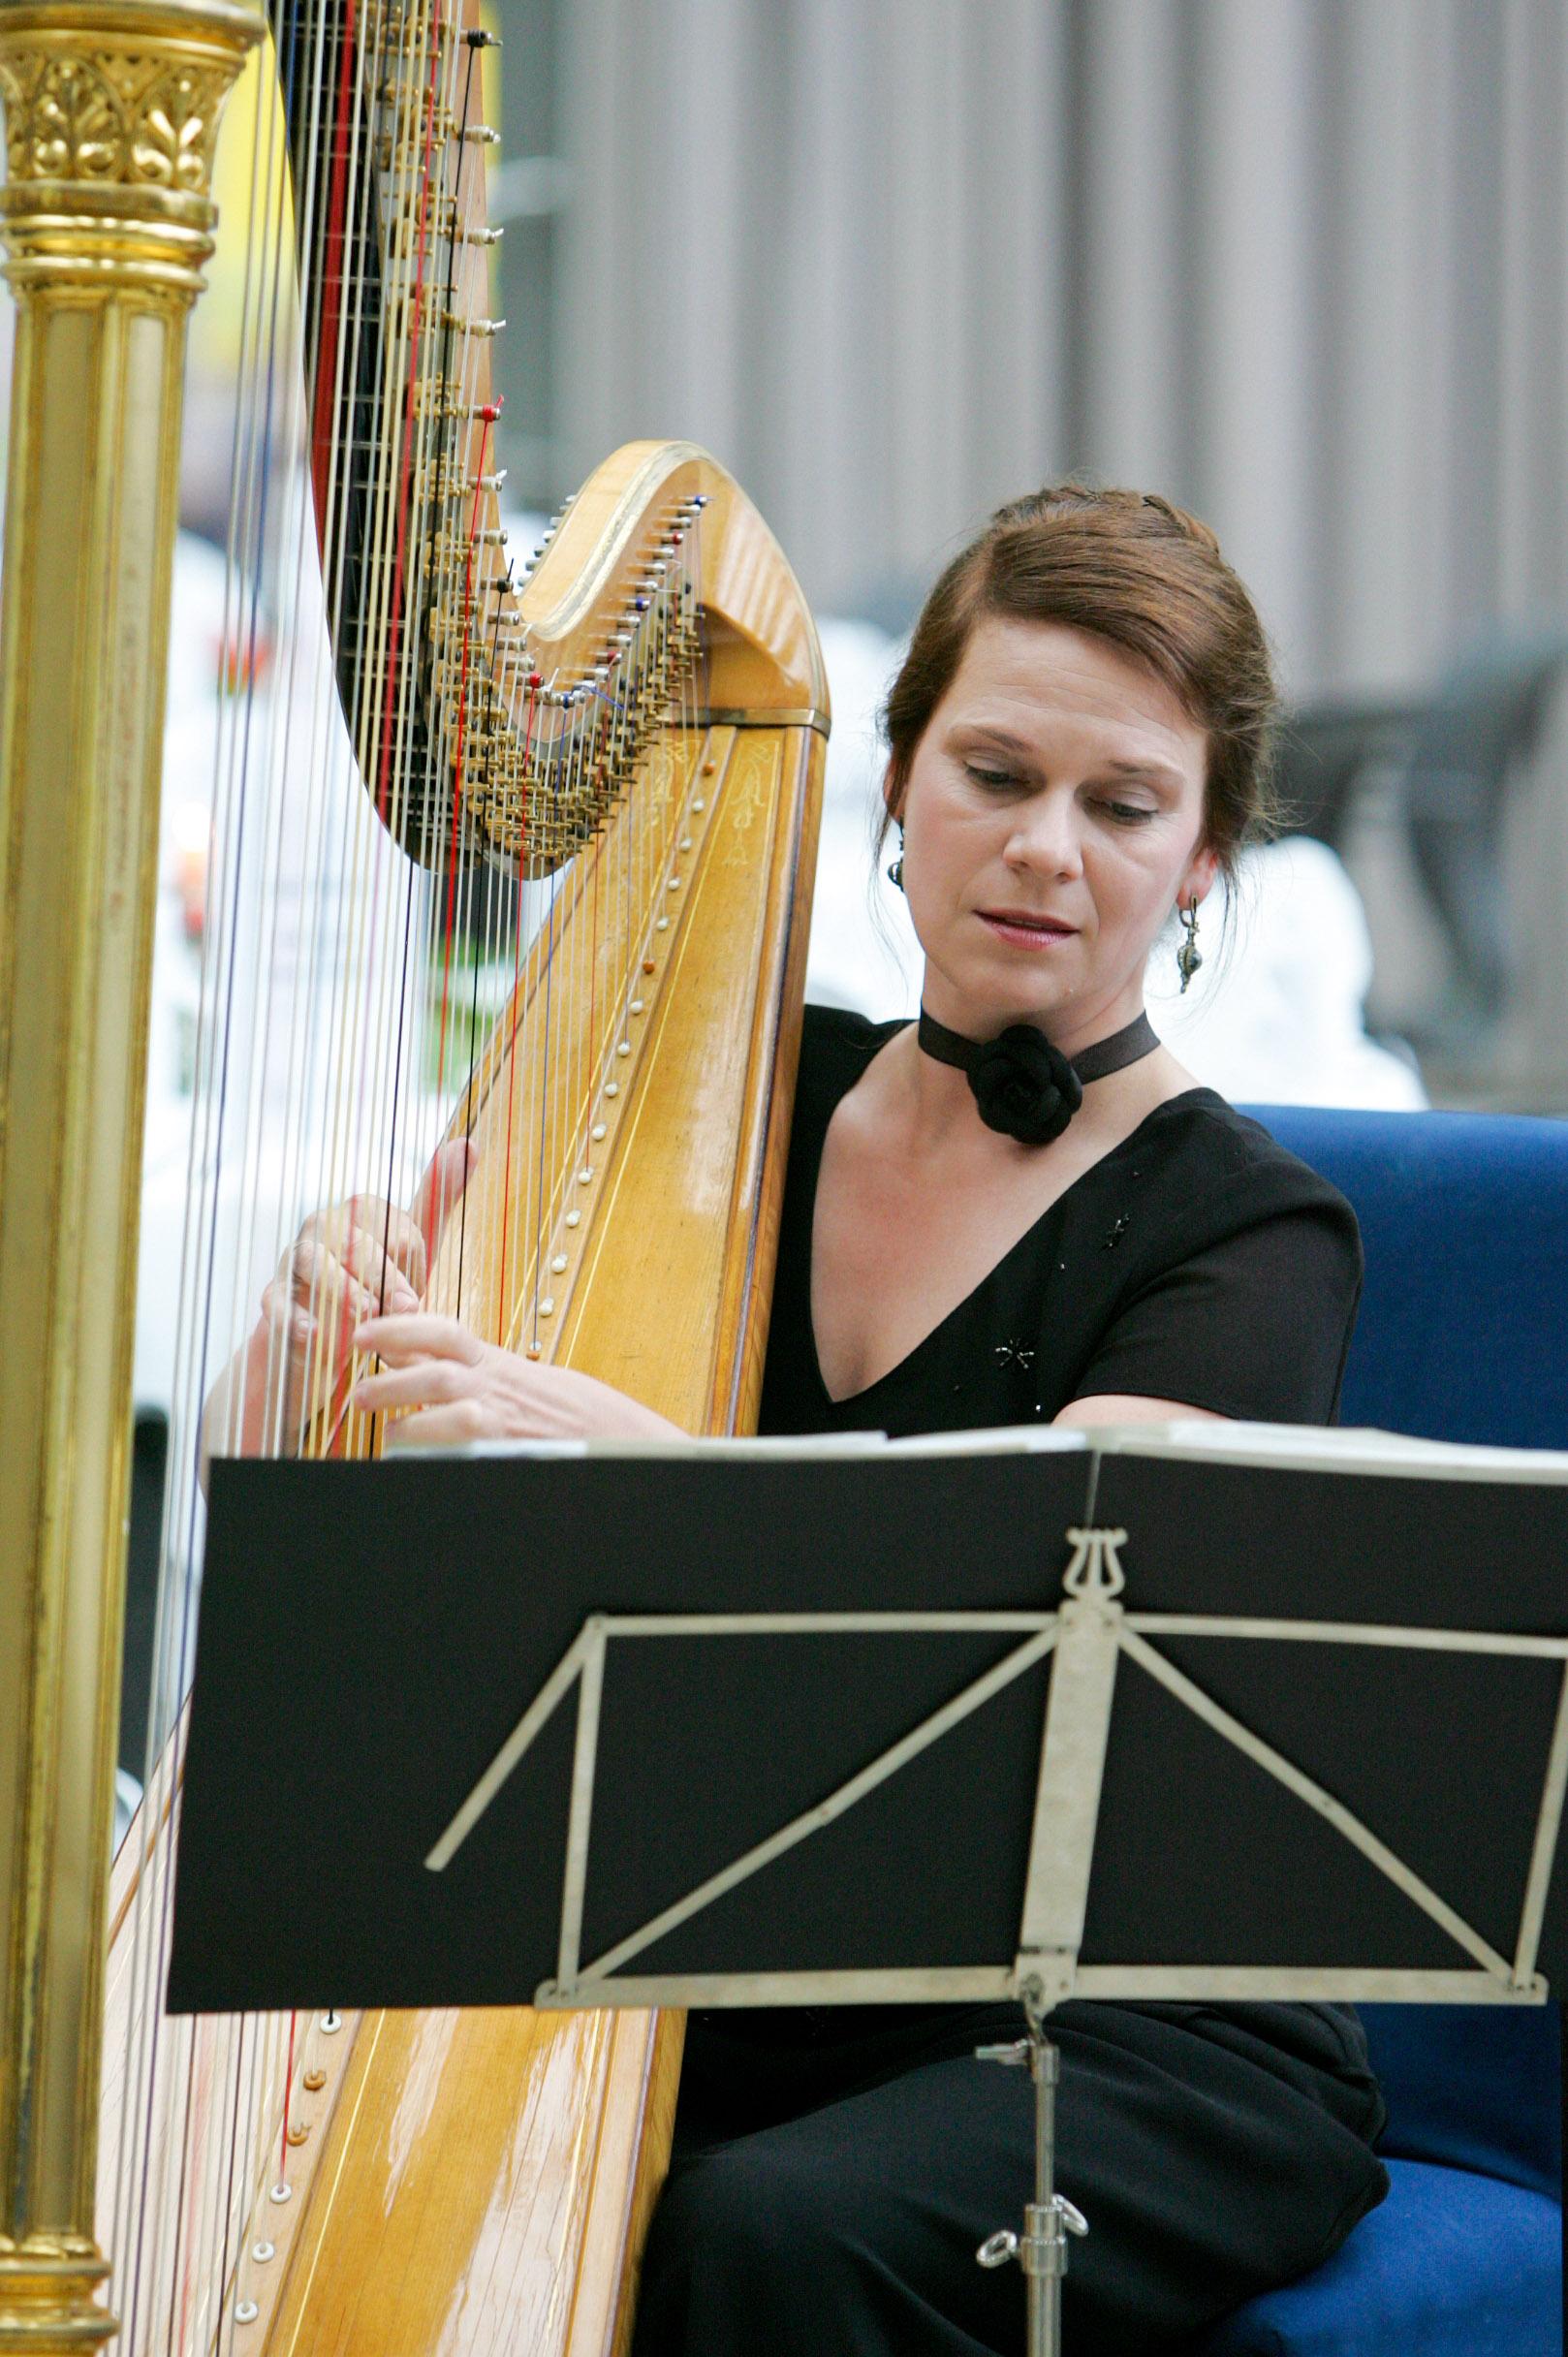 Harfenistin Harfespielen lernen